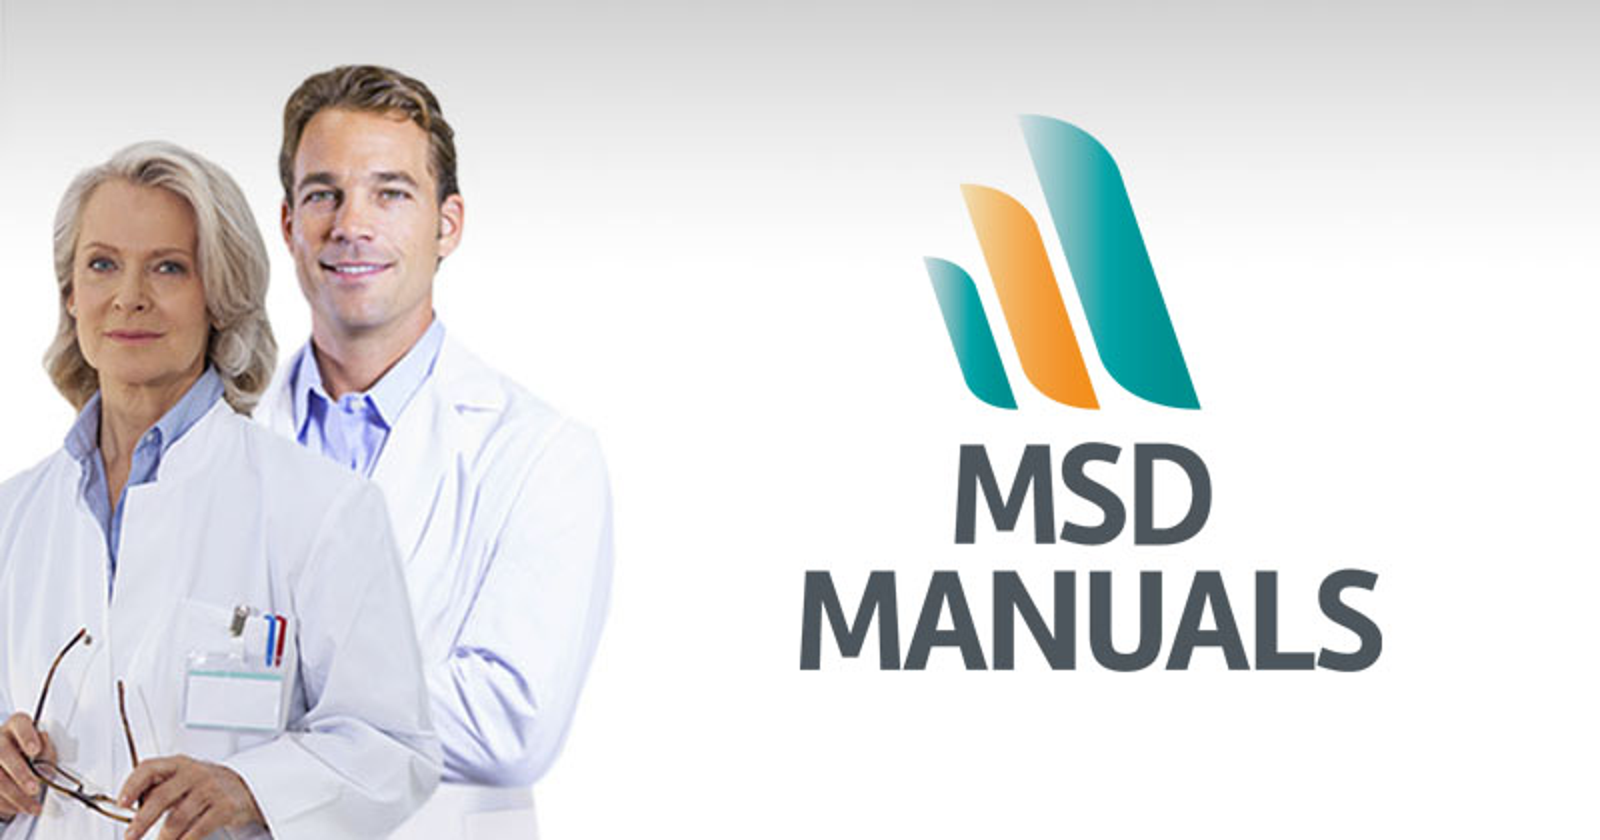 www.msdmanuals.com